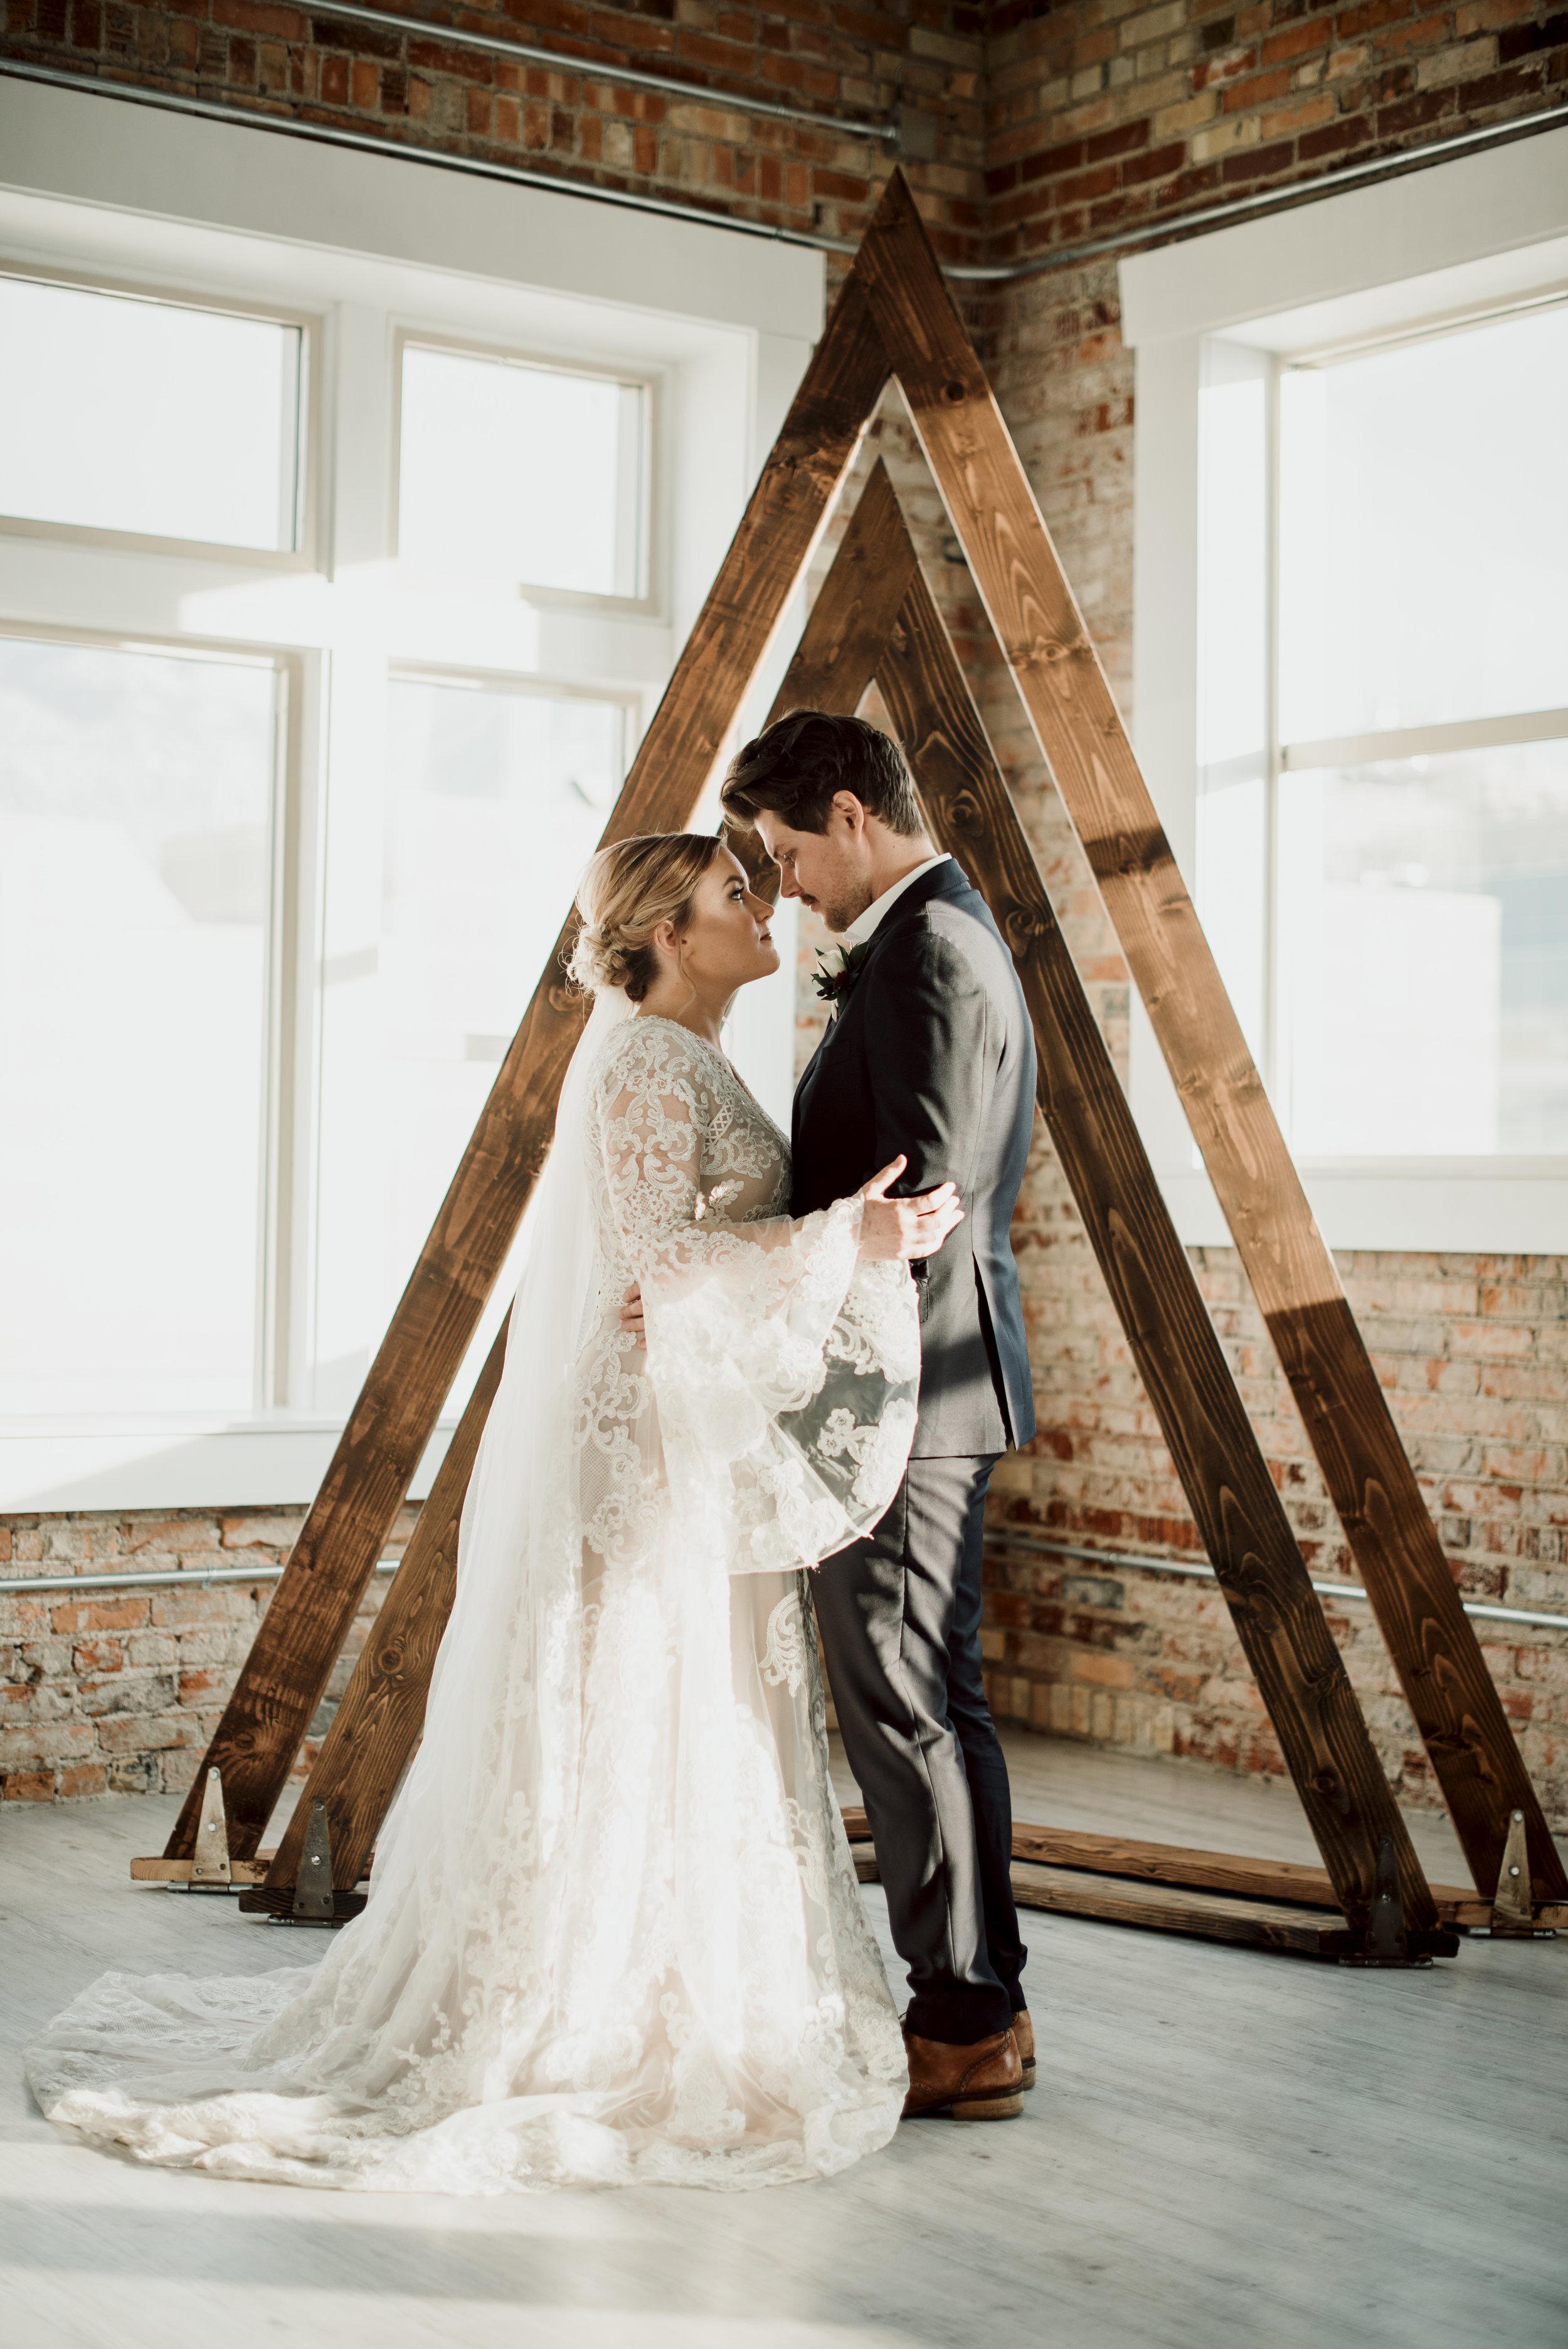 Colorado Wedding & Engagement Photographer | Adventure Elopement Photographer | Small Intimate Weddings Colorado | Moab Elopement & Wedding Photographer